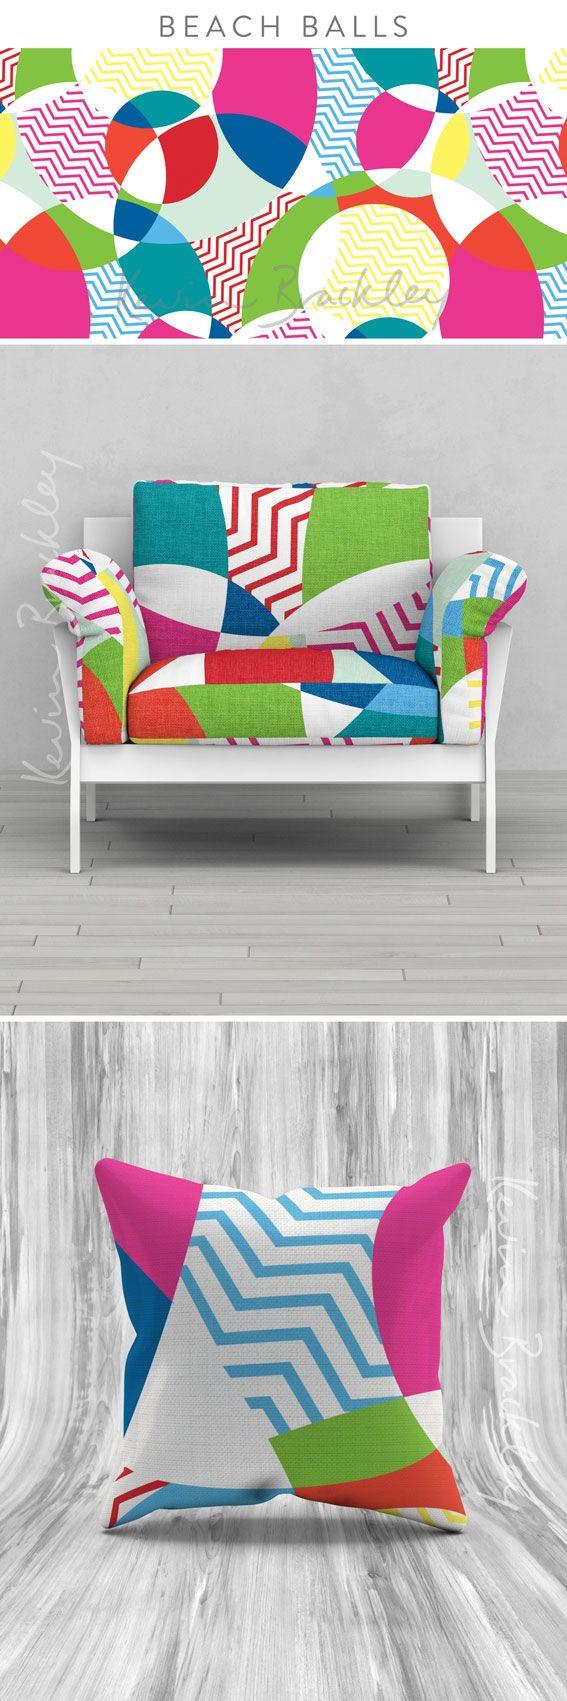 Home decor concepts in my Beach Balls design